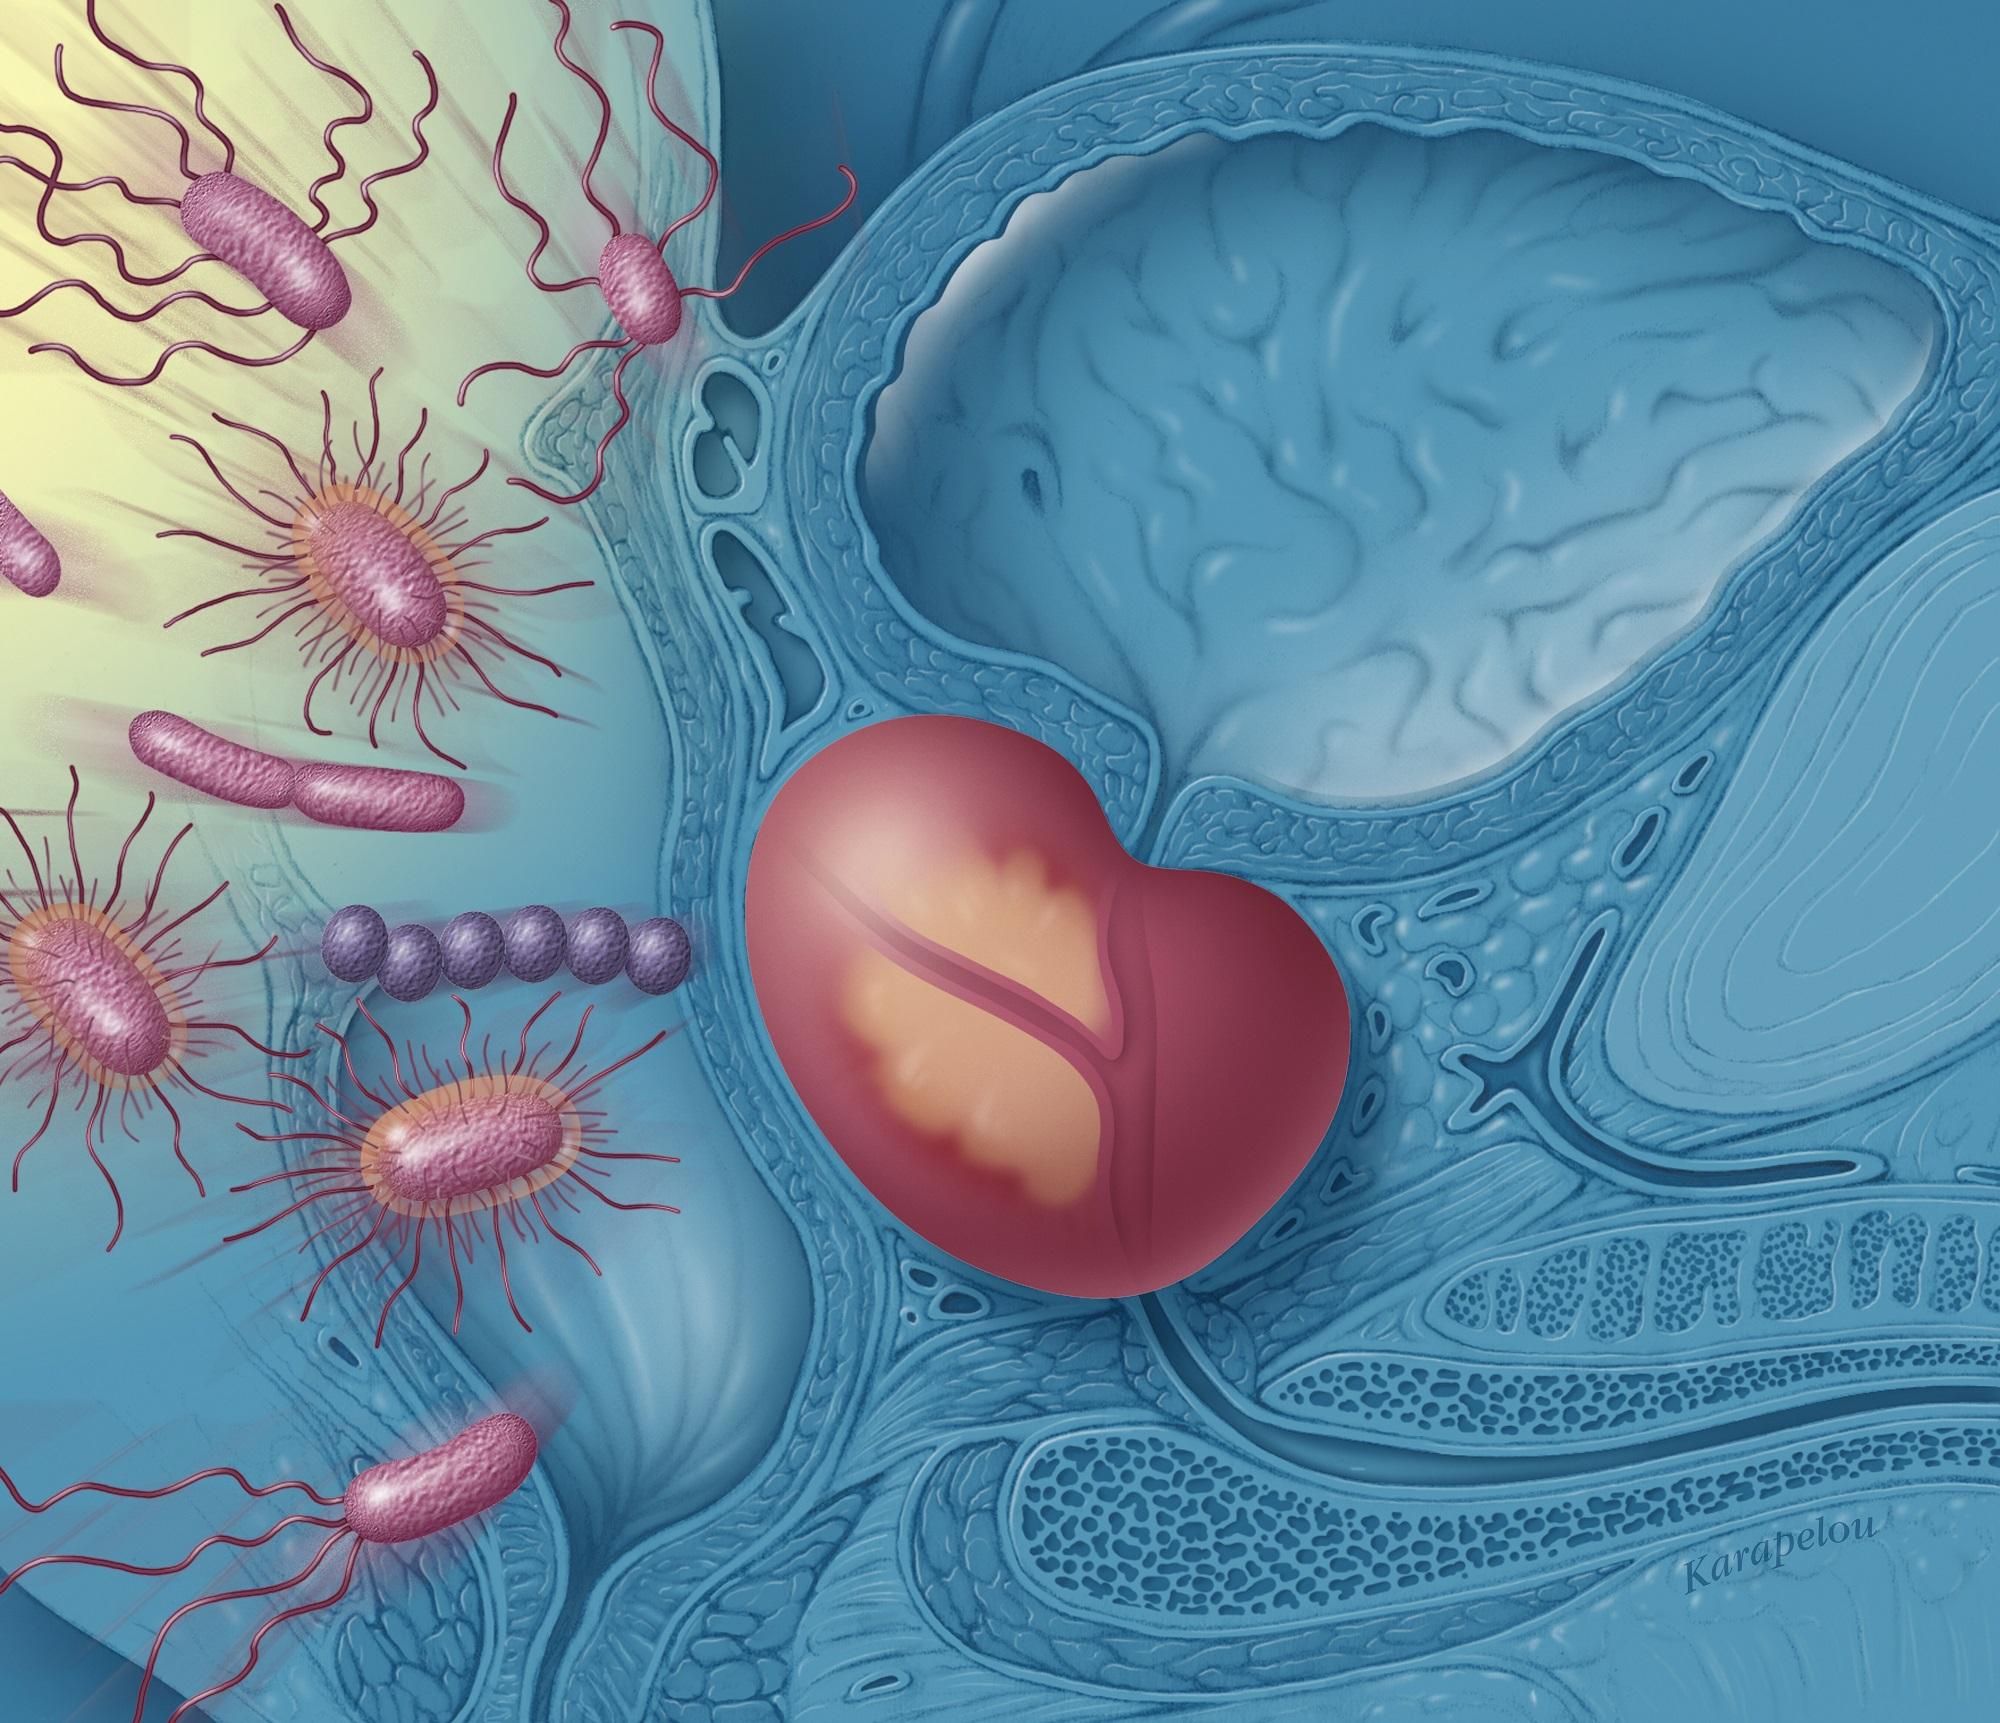 Tratamentul disfuncției erectile | Health tips | Lifestyle si sfaturi